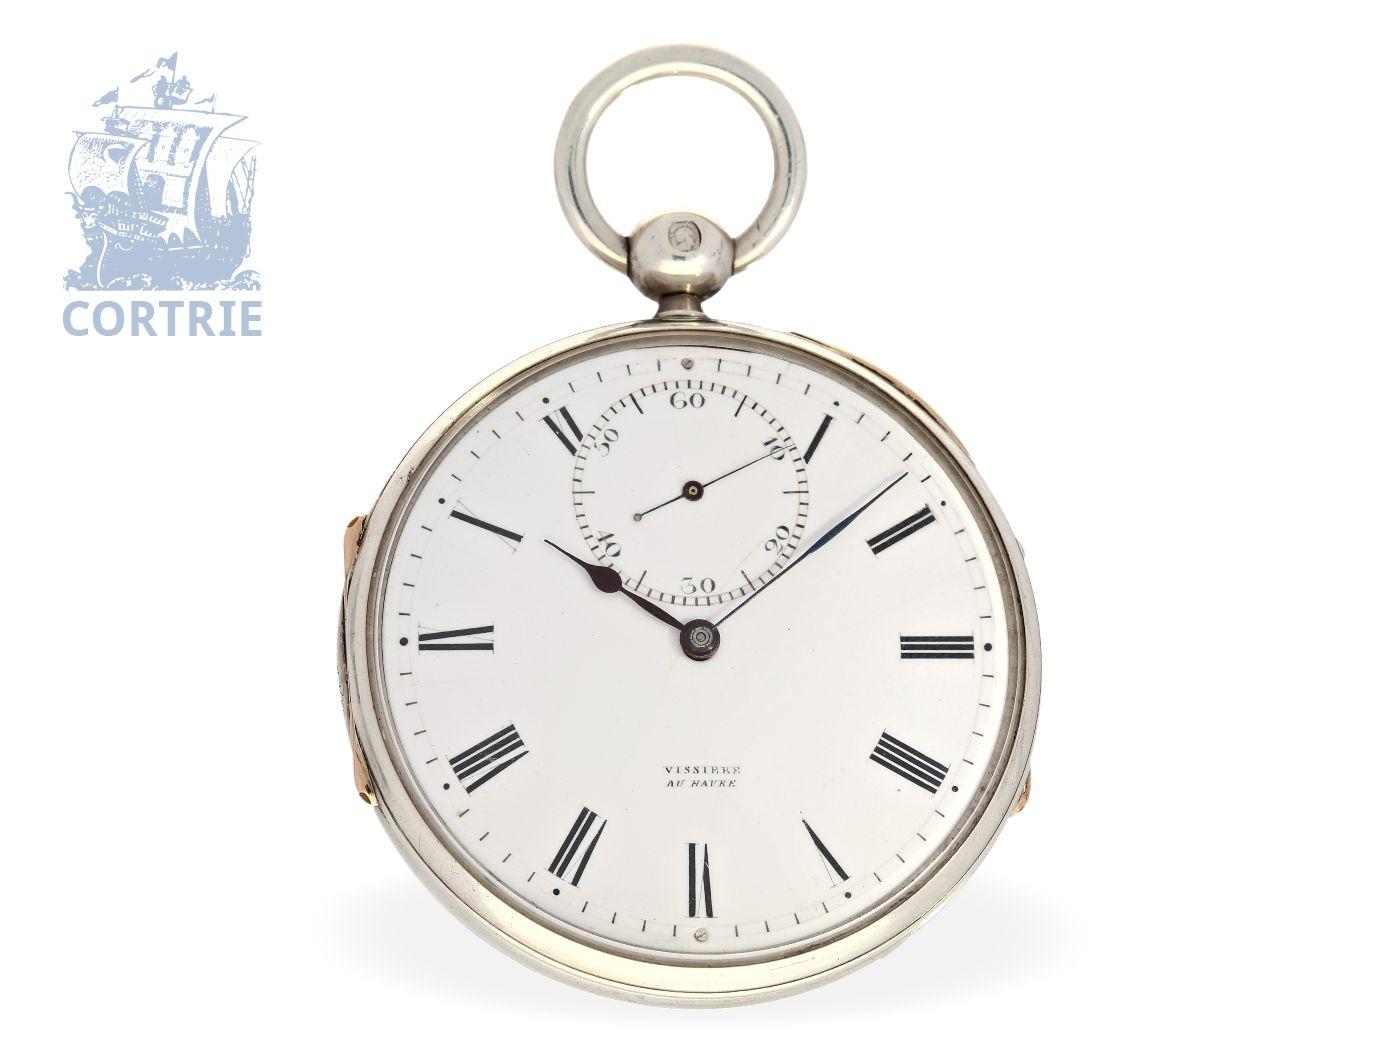 Pocket watch: very rare and very fine pocket watch chronometer, Winnerl-Schüler Simon Vissière (1822-1887) Le Havre France No.148, ca.1870-